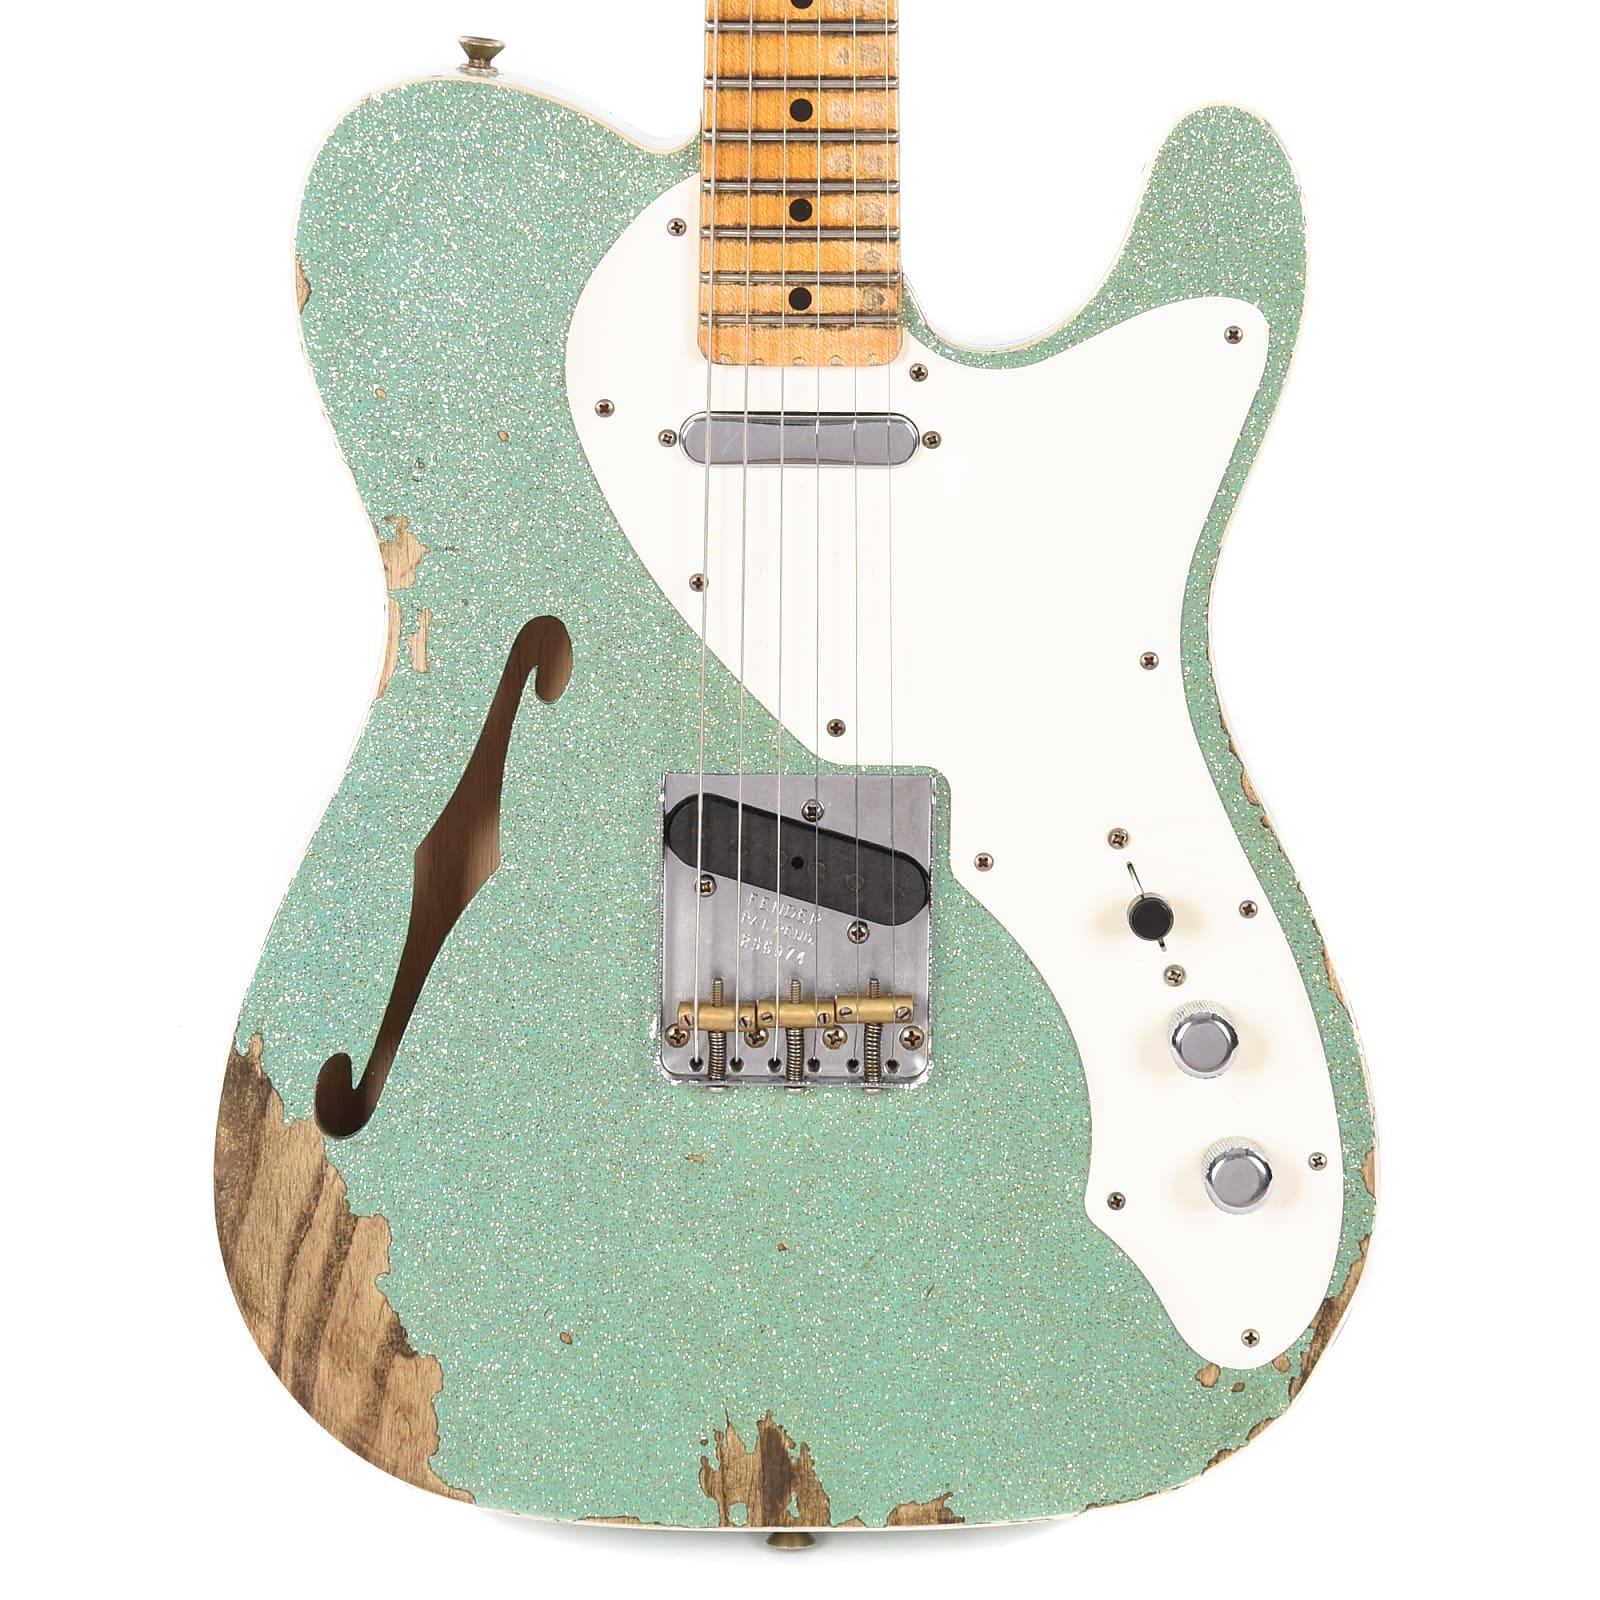 Fender Custom Shop 2018 NAMM Limited '50s Custom Telecaster Thinline Aged  Seafoam Sparkle